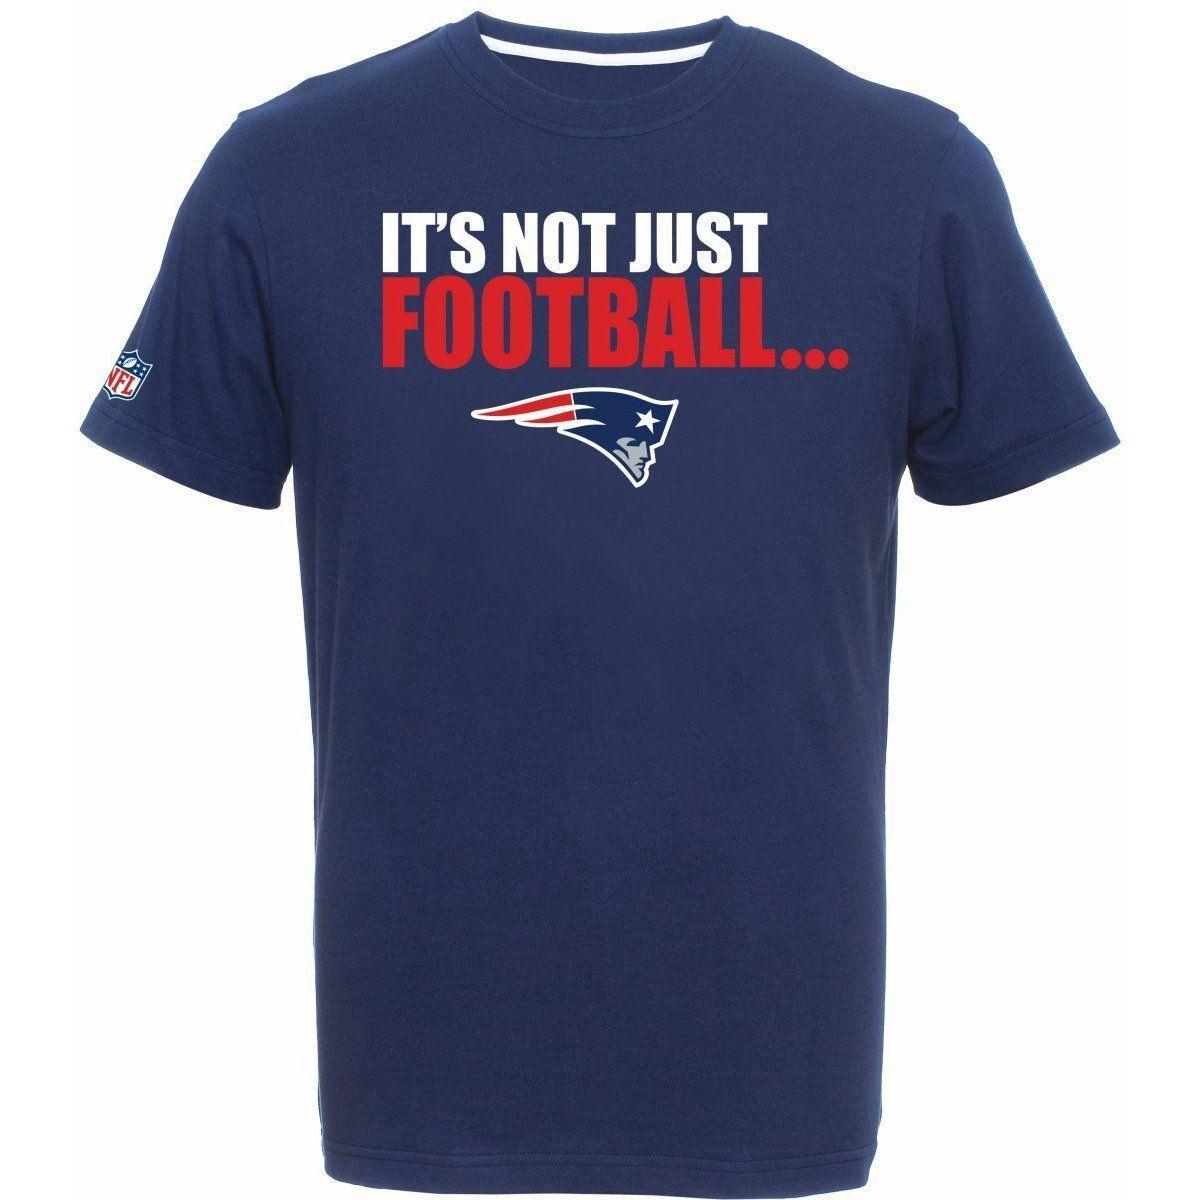 NFL FOOTBALL T-shirt Nuovo England Patriots it 's not just FOOTBALL